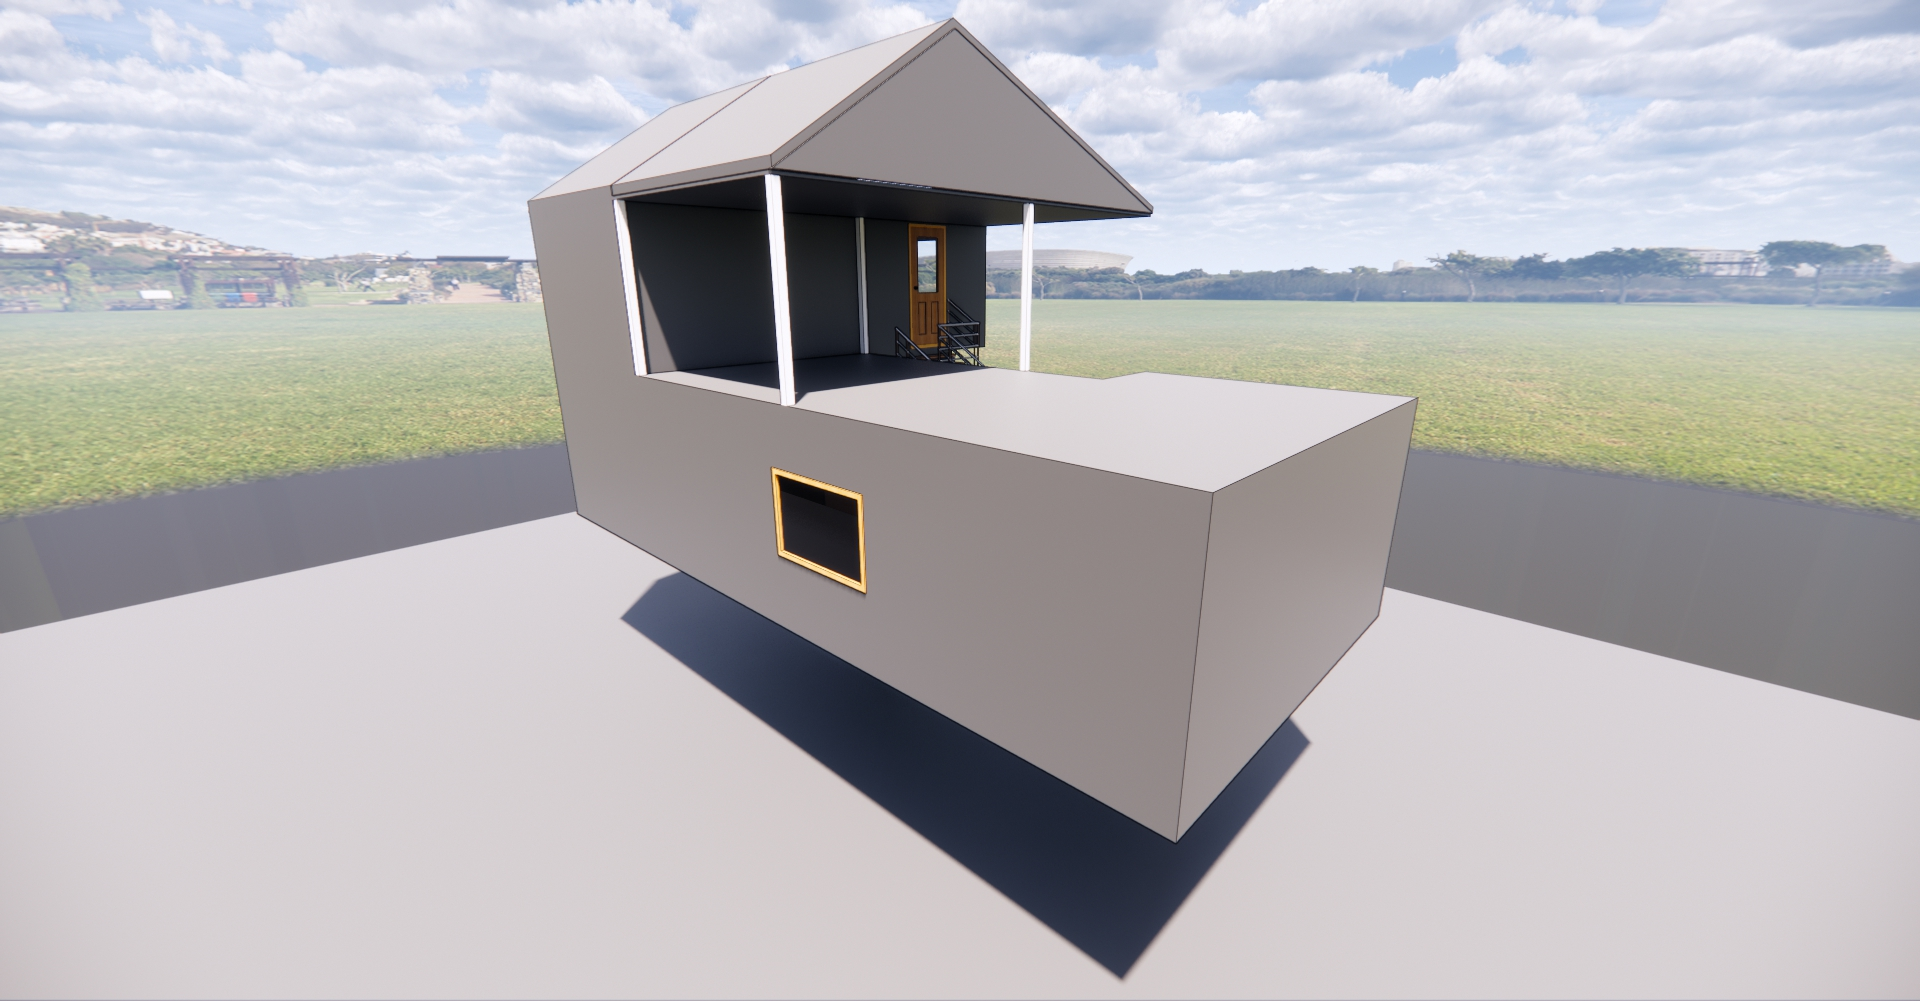 مدل 3 بعدی فضا 2